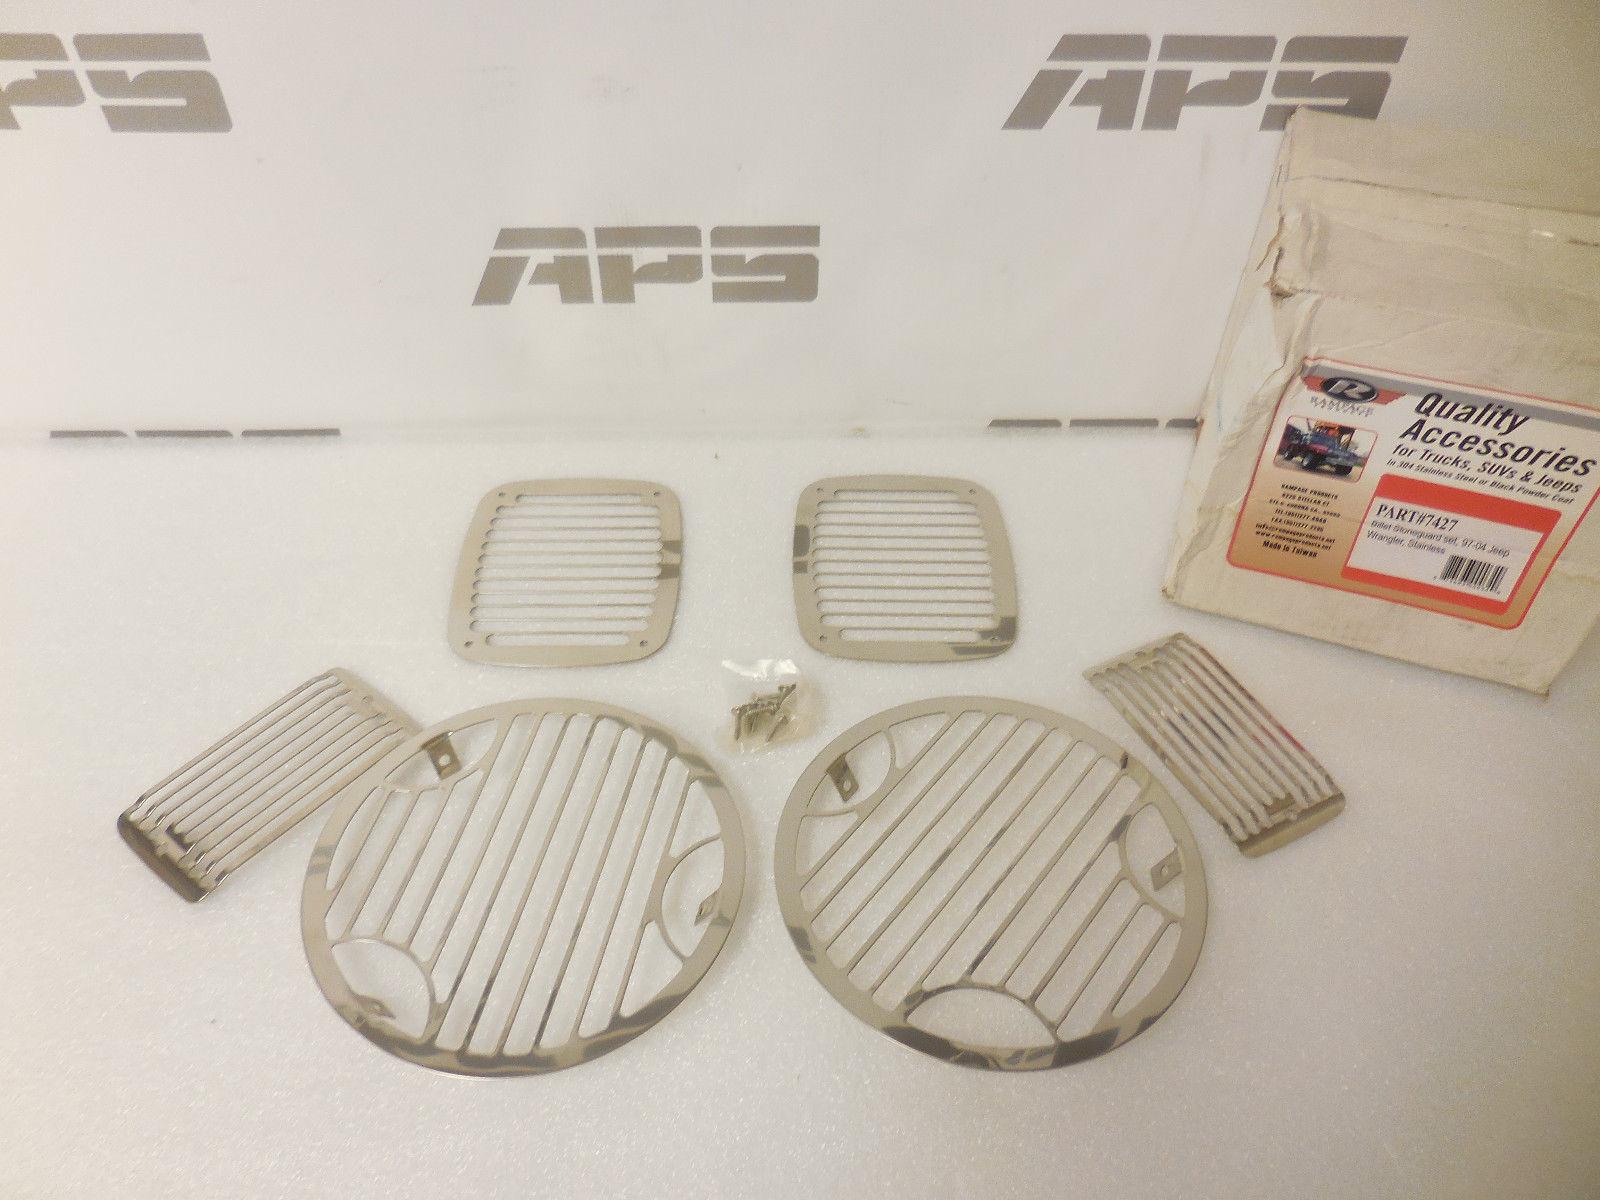 US ライトガード プロテクター New 97-06ジープラングラーTJ 6ピースステンレススチールライトガードキットRampage#7427 New 97-06 Jeep Wrangler TJ 6 piece stainless steel light guard kit Rampage #7427